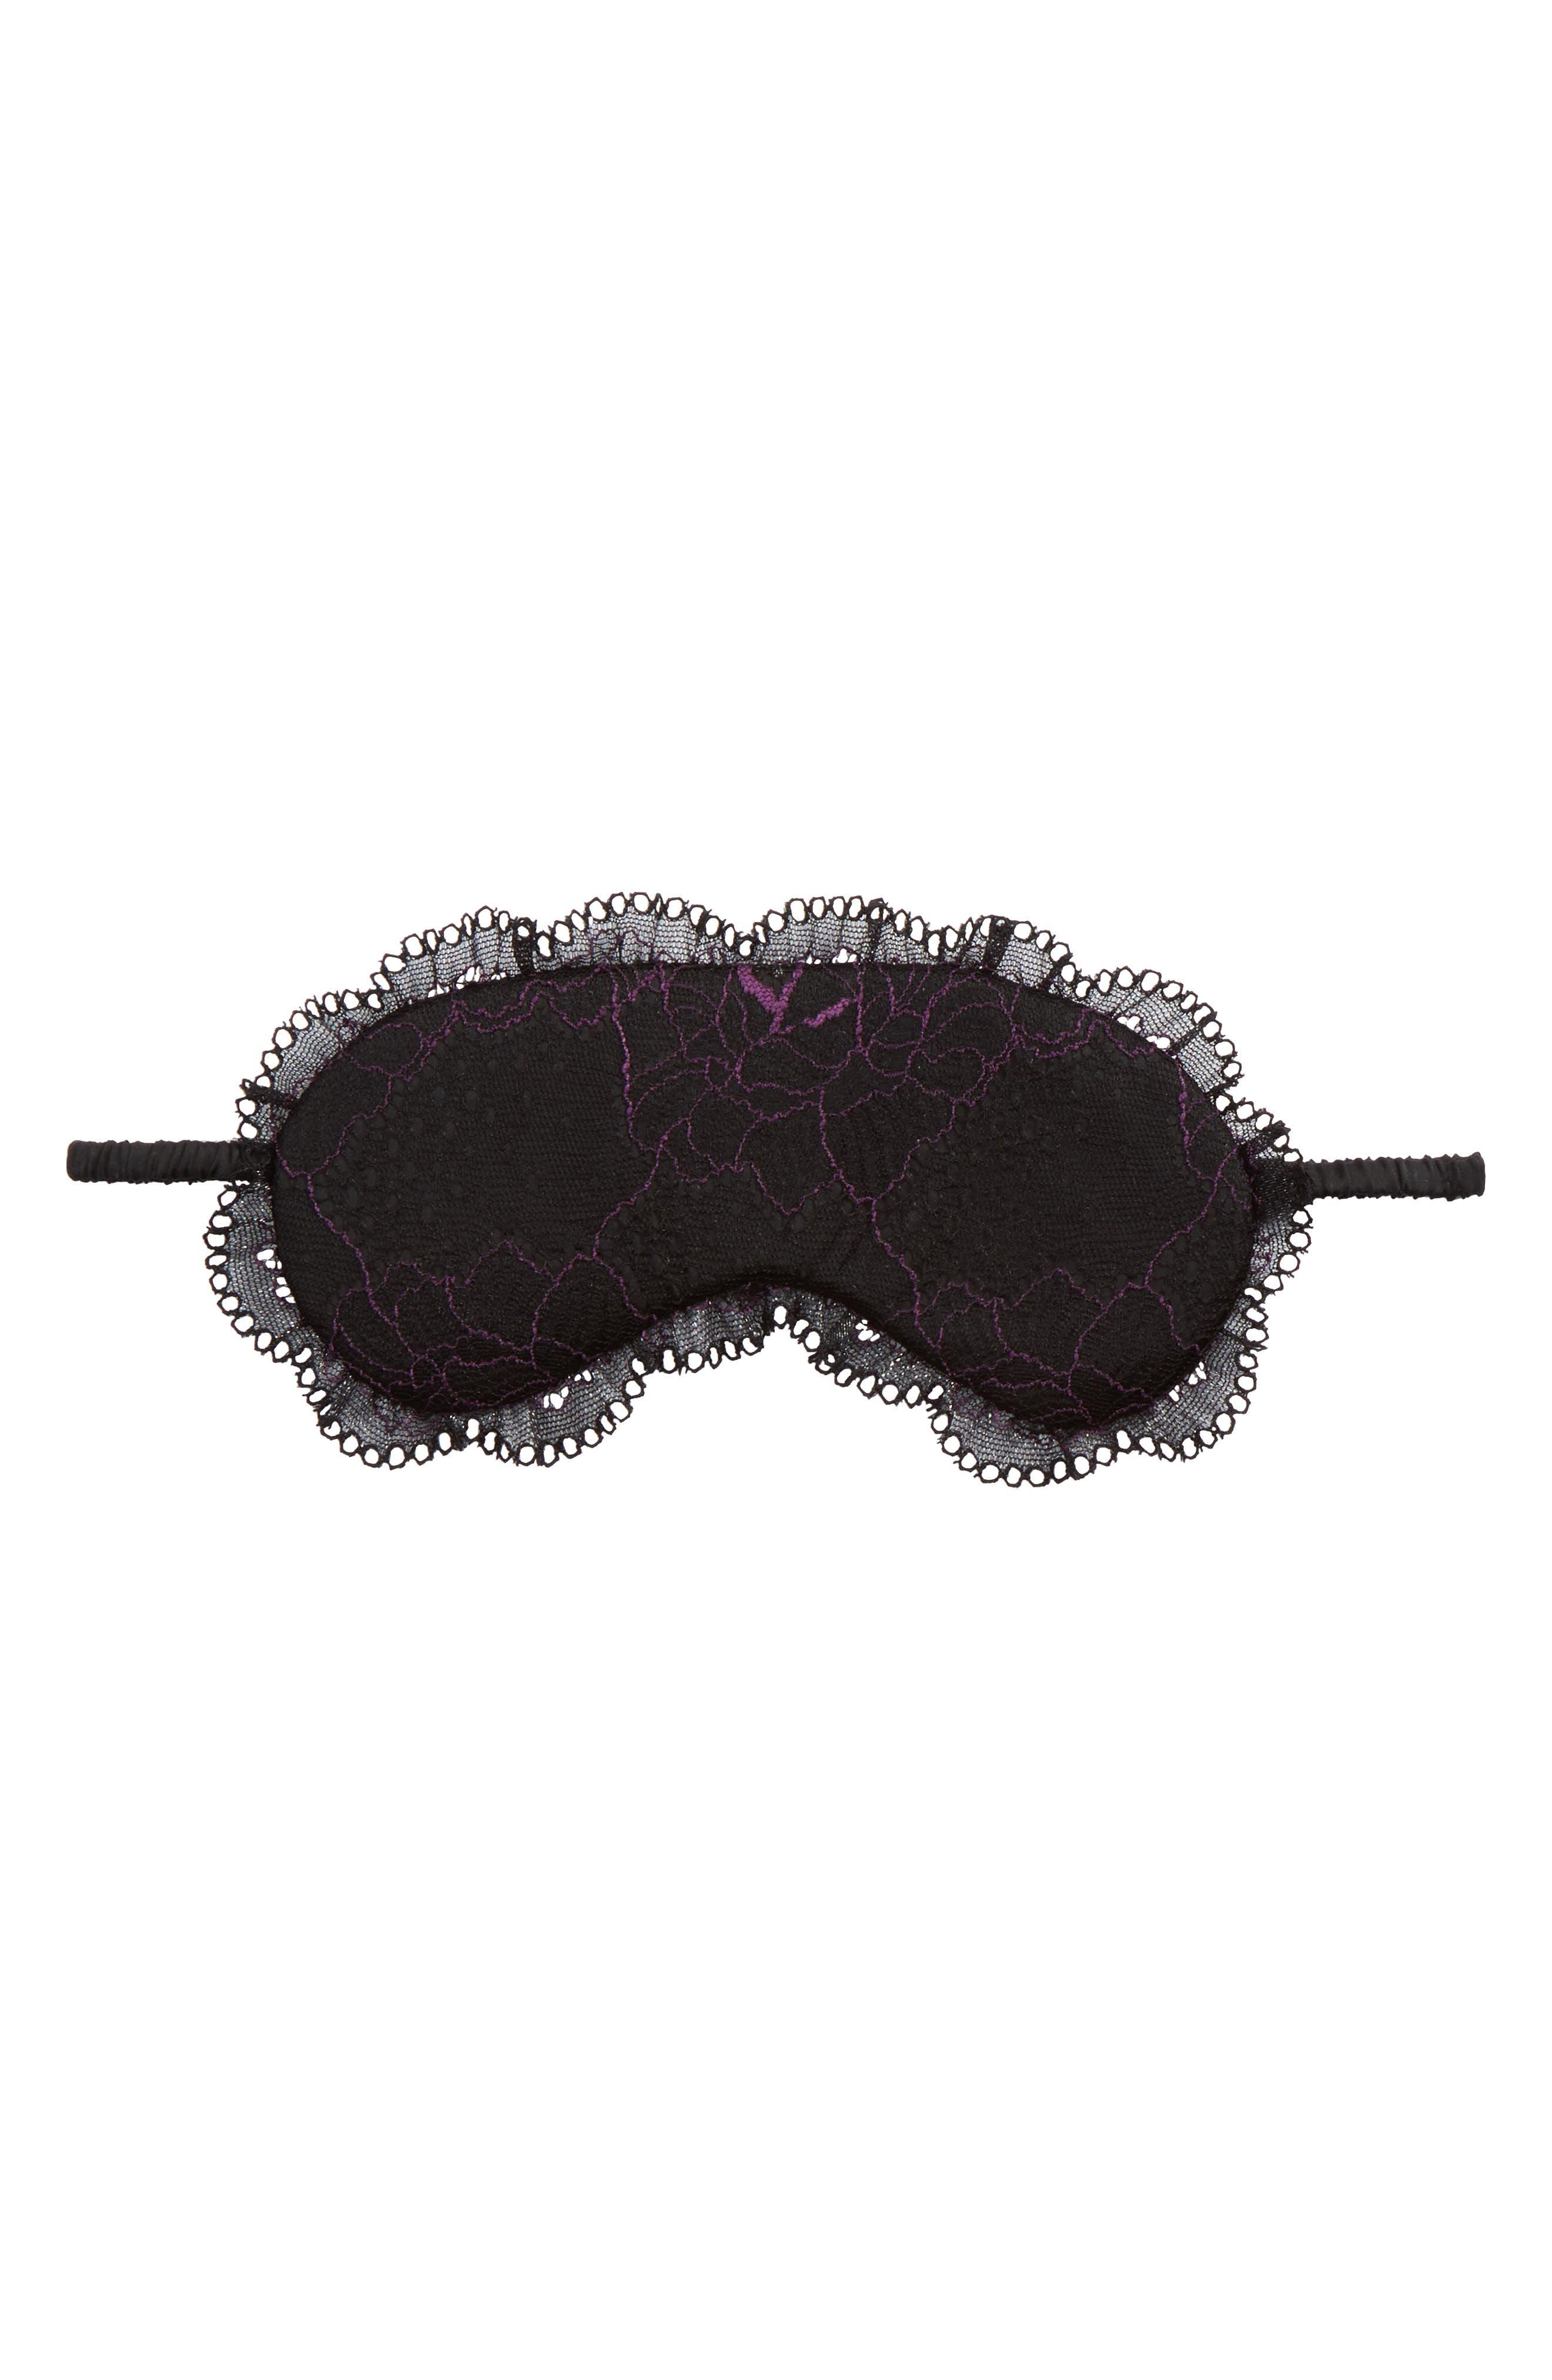 Flirty Sleep Mask,                             Main thumbnail 1, color,                             Black/ Purple Dragon